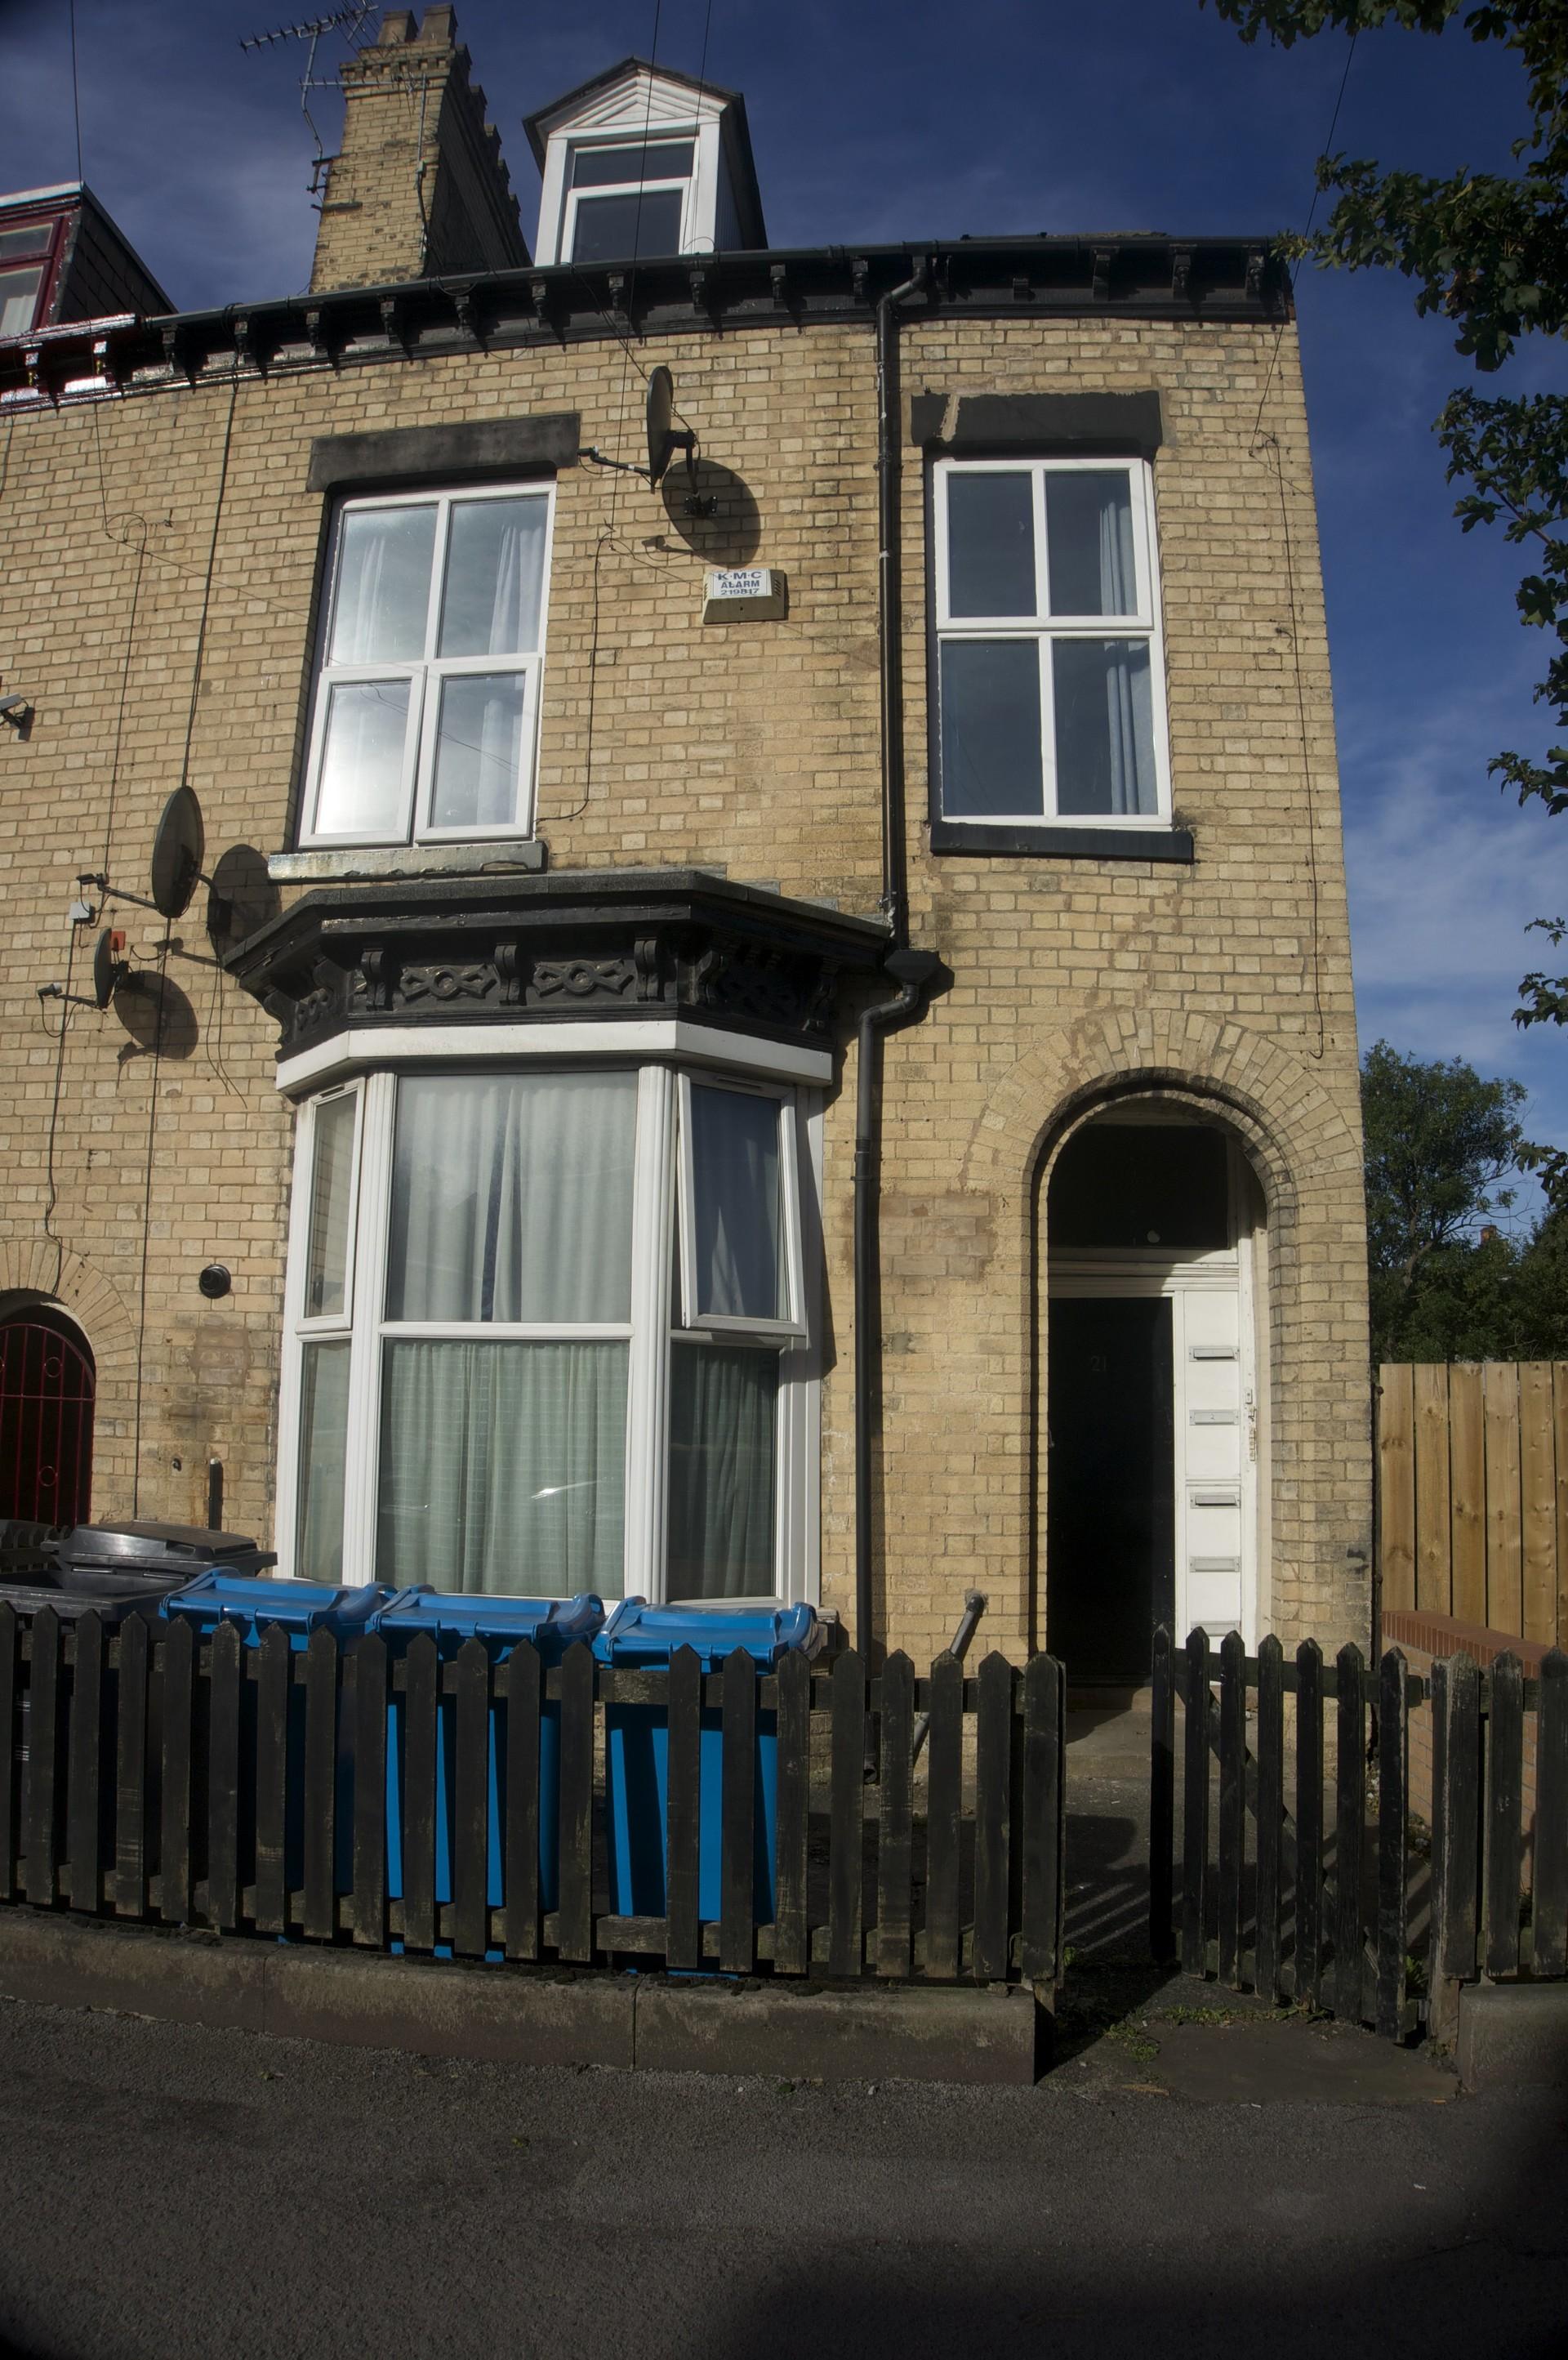 large-1-bedroom-flat-close-university-3c4dafa6bba4dc71d9e48a3b92d33924